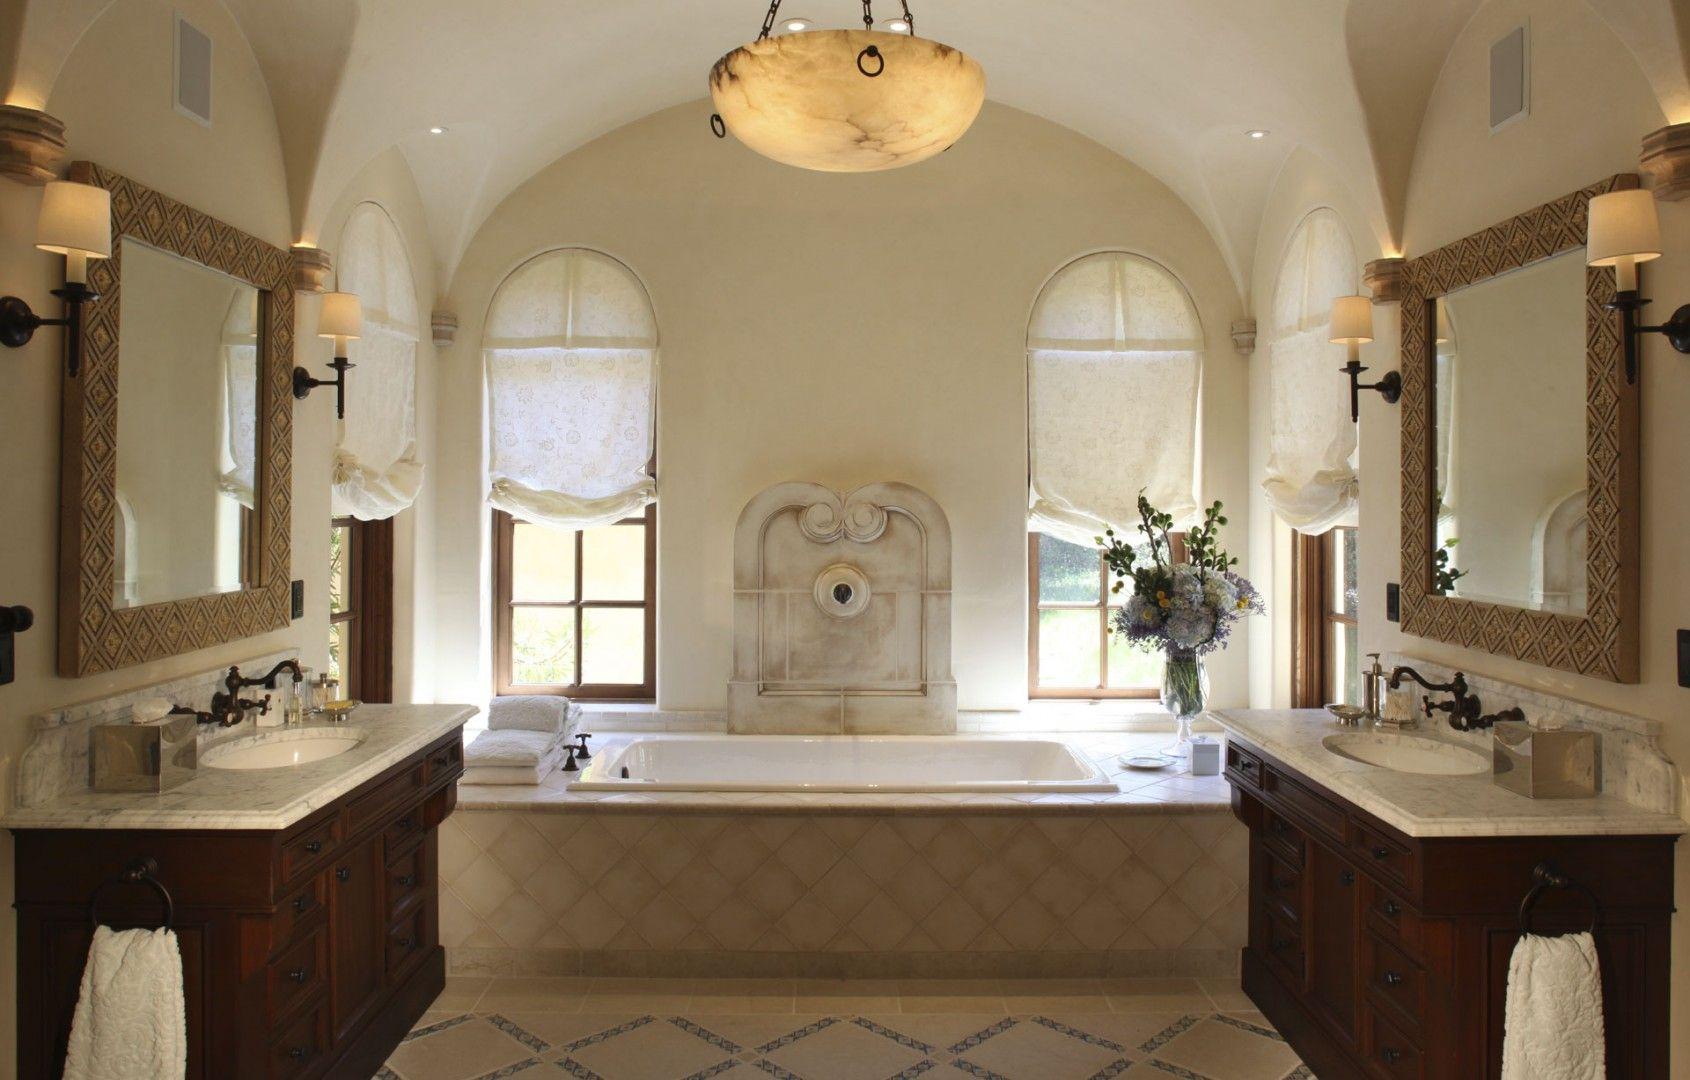 Mediterranean Bathroom Design Fascinating Image Result For Spanish Bathroom  Spanish Bathroom  Pinterest Design Inspiration